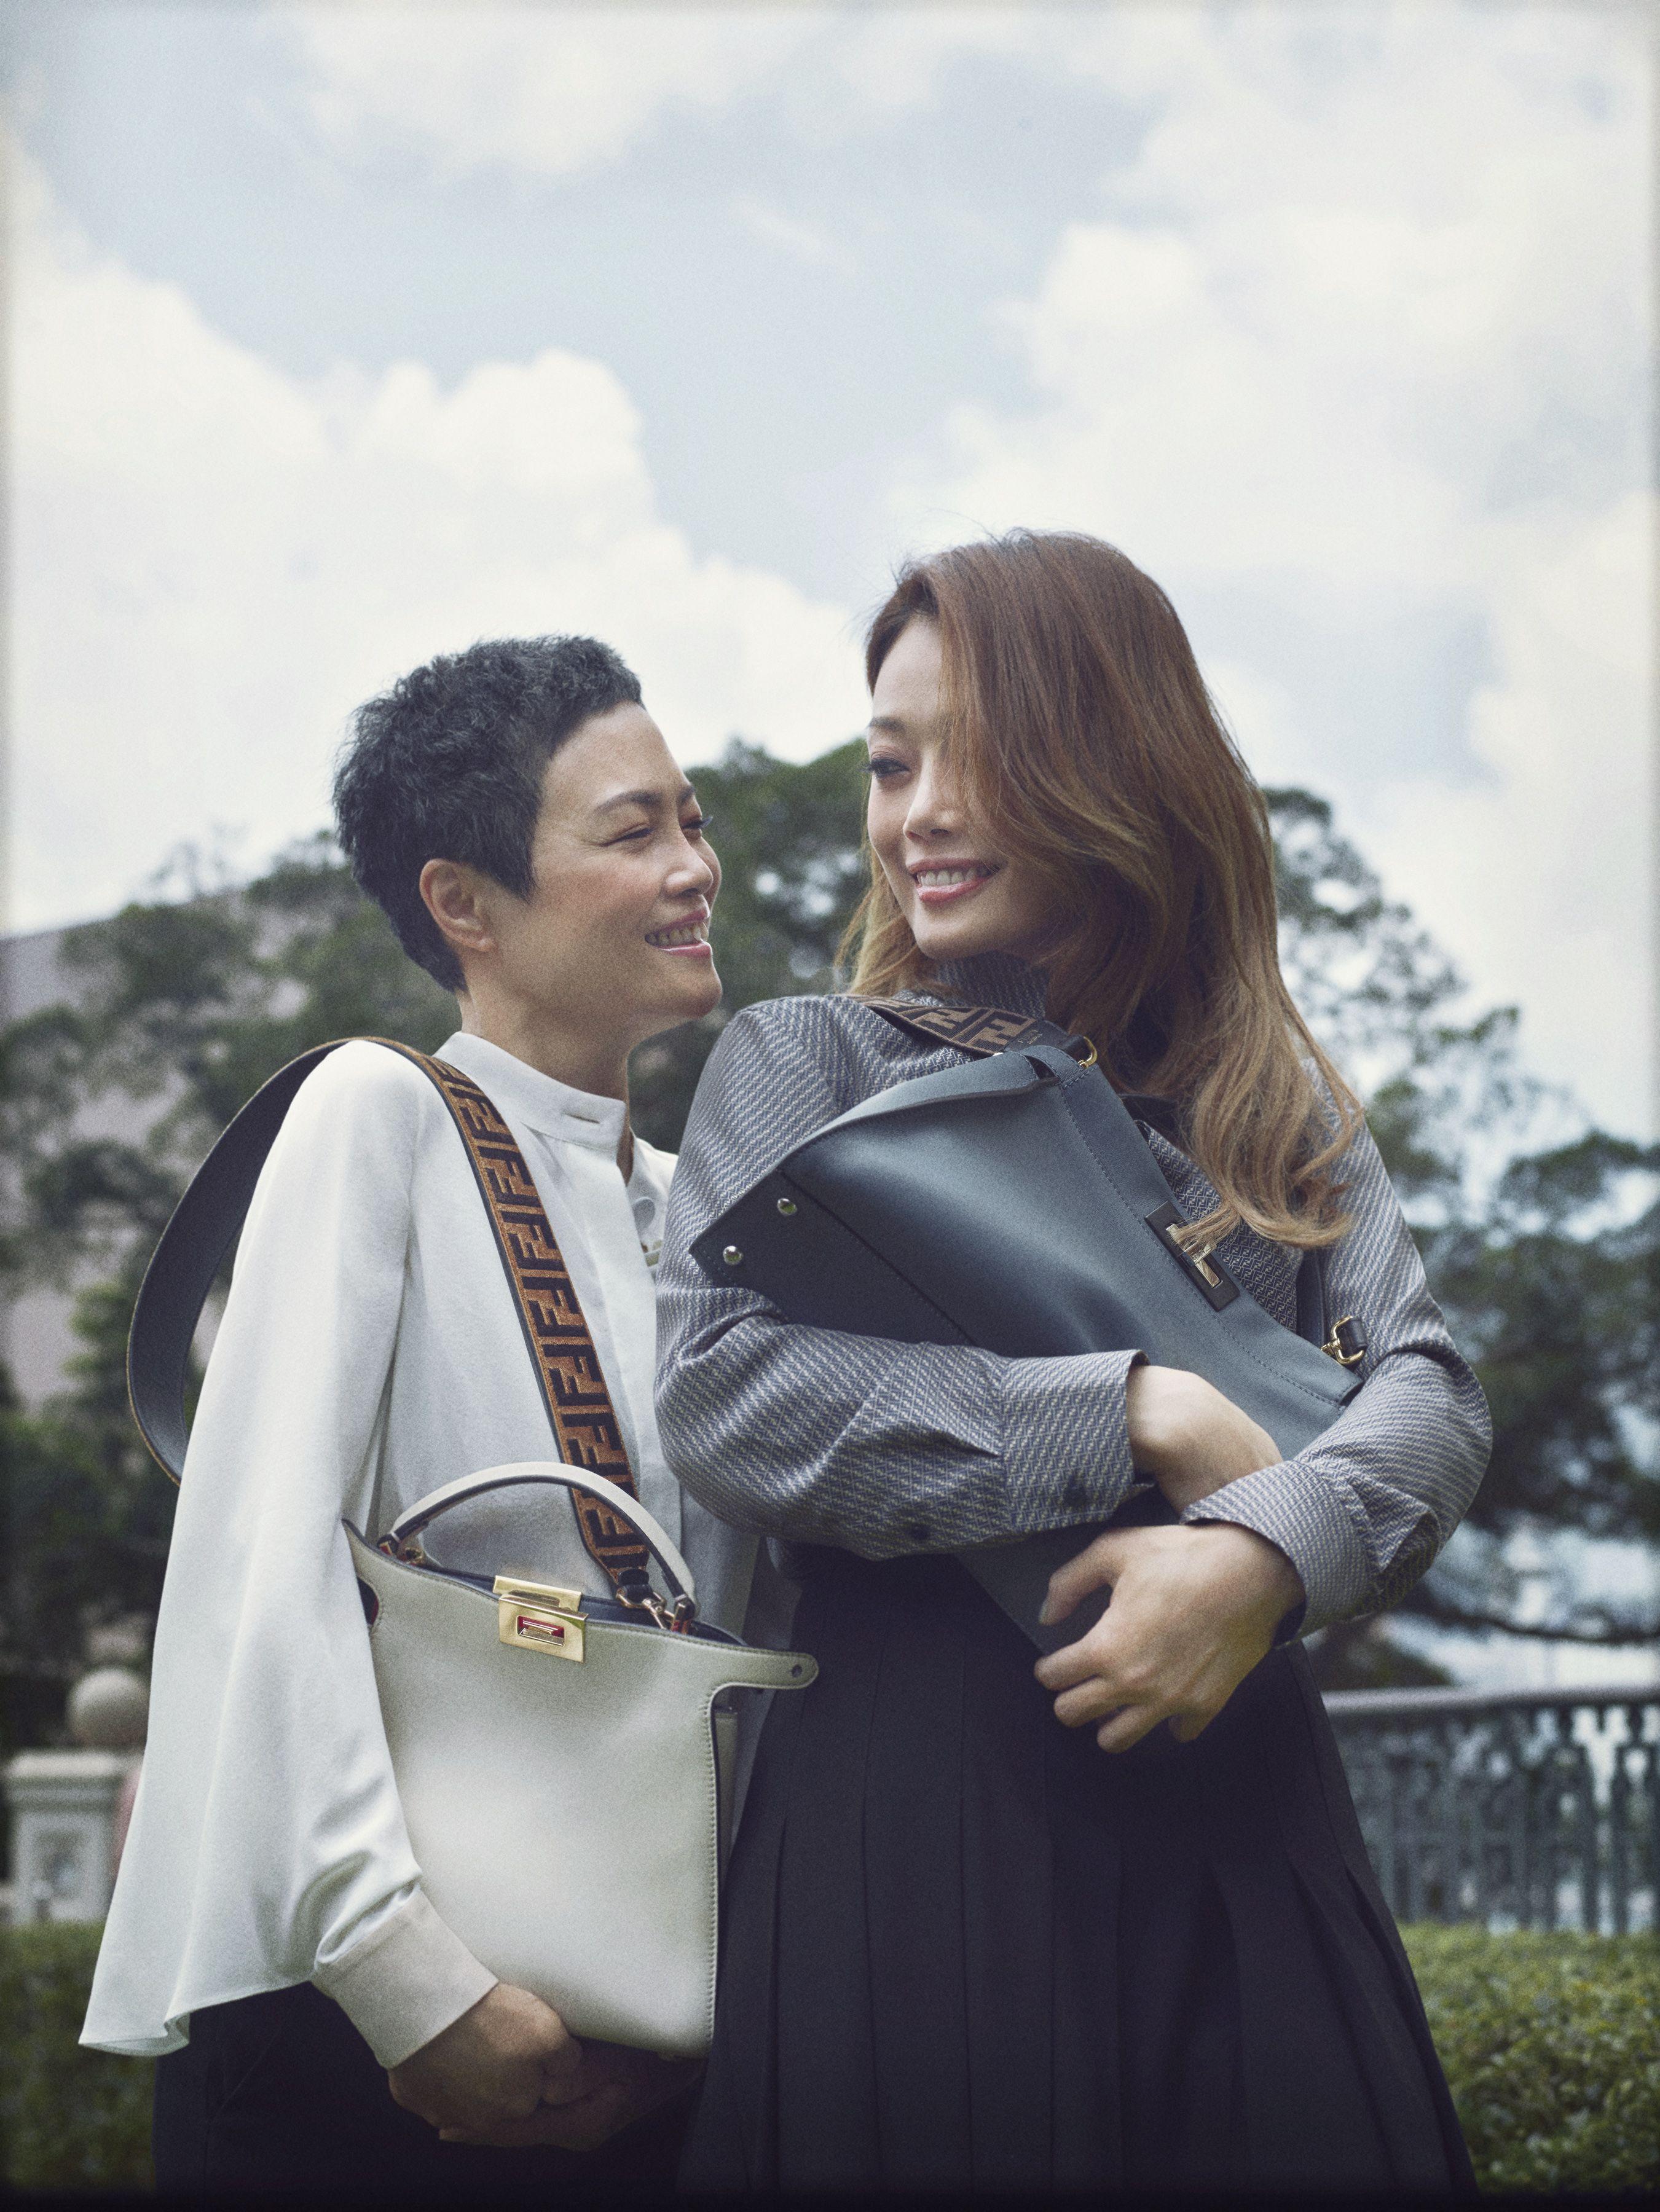 Dou jiayuan dating